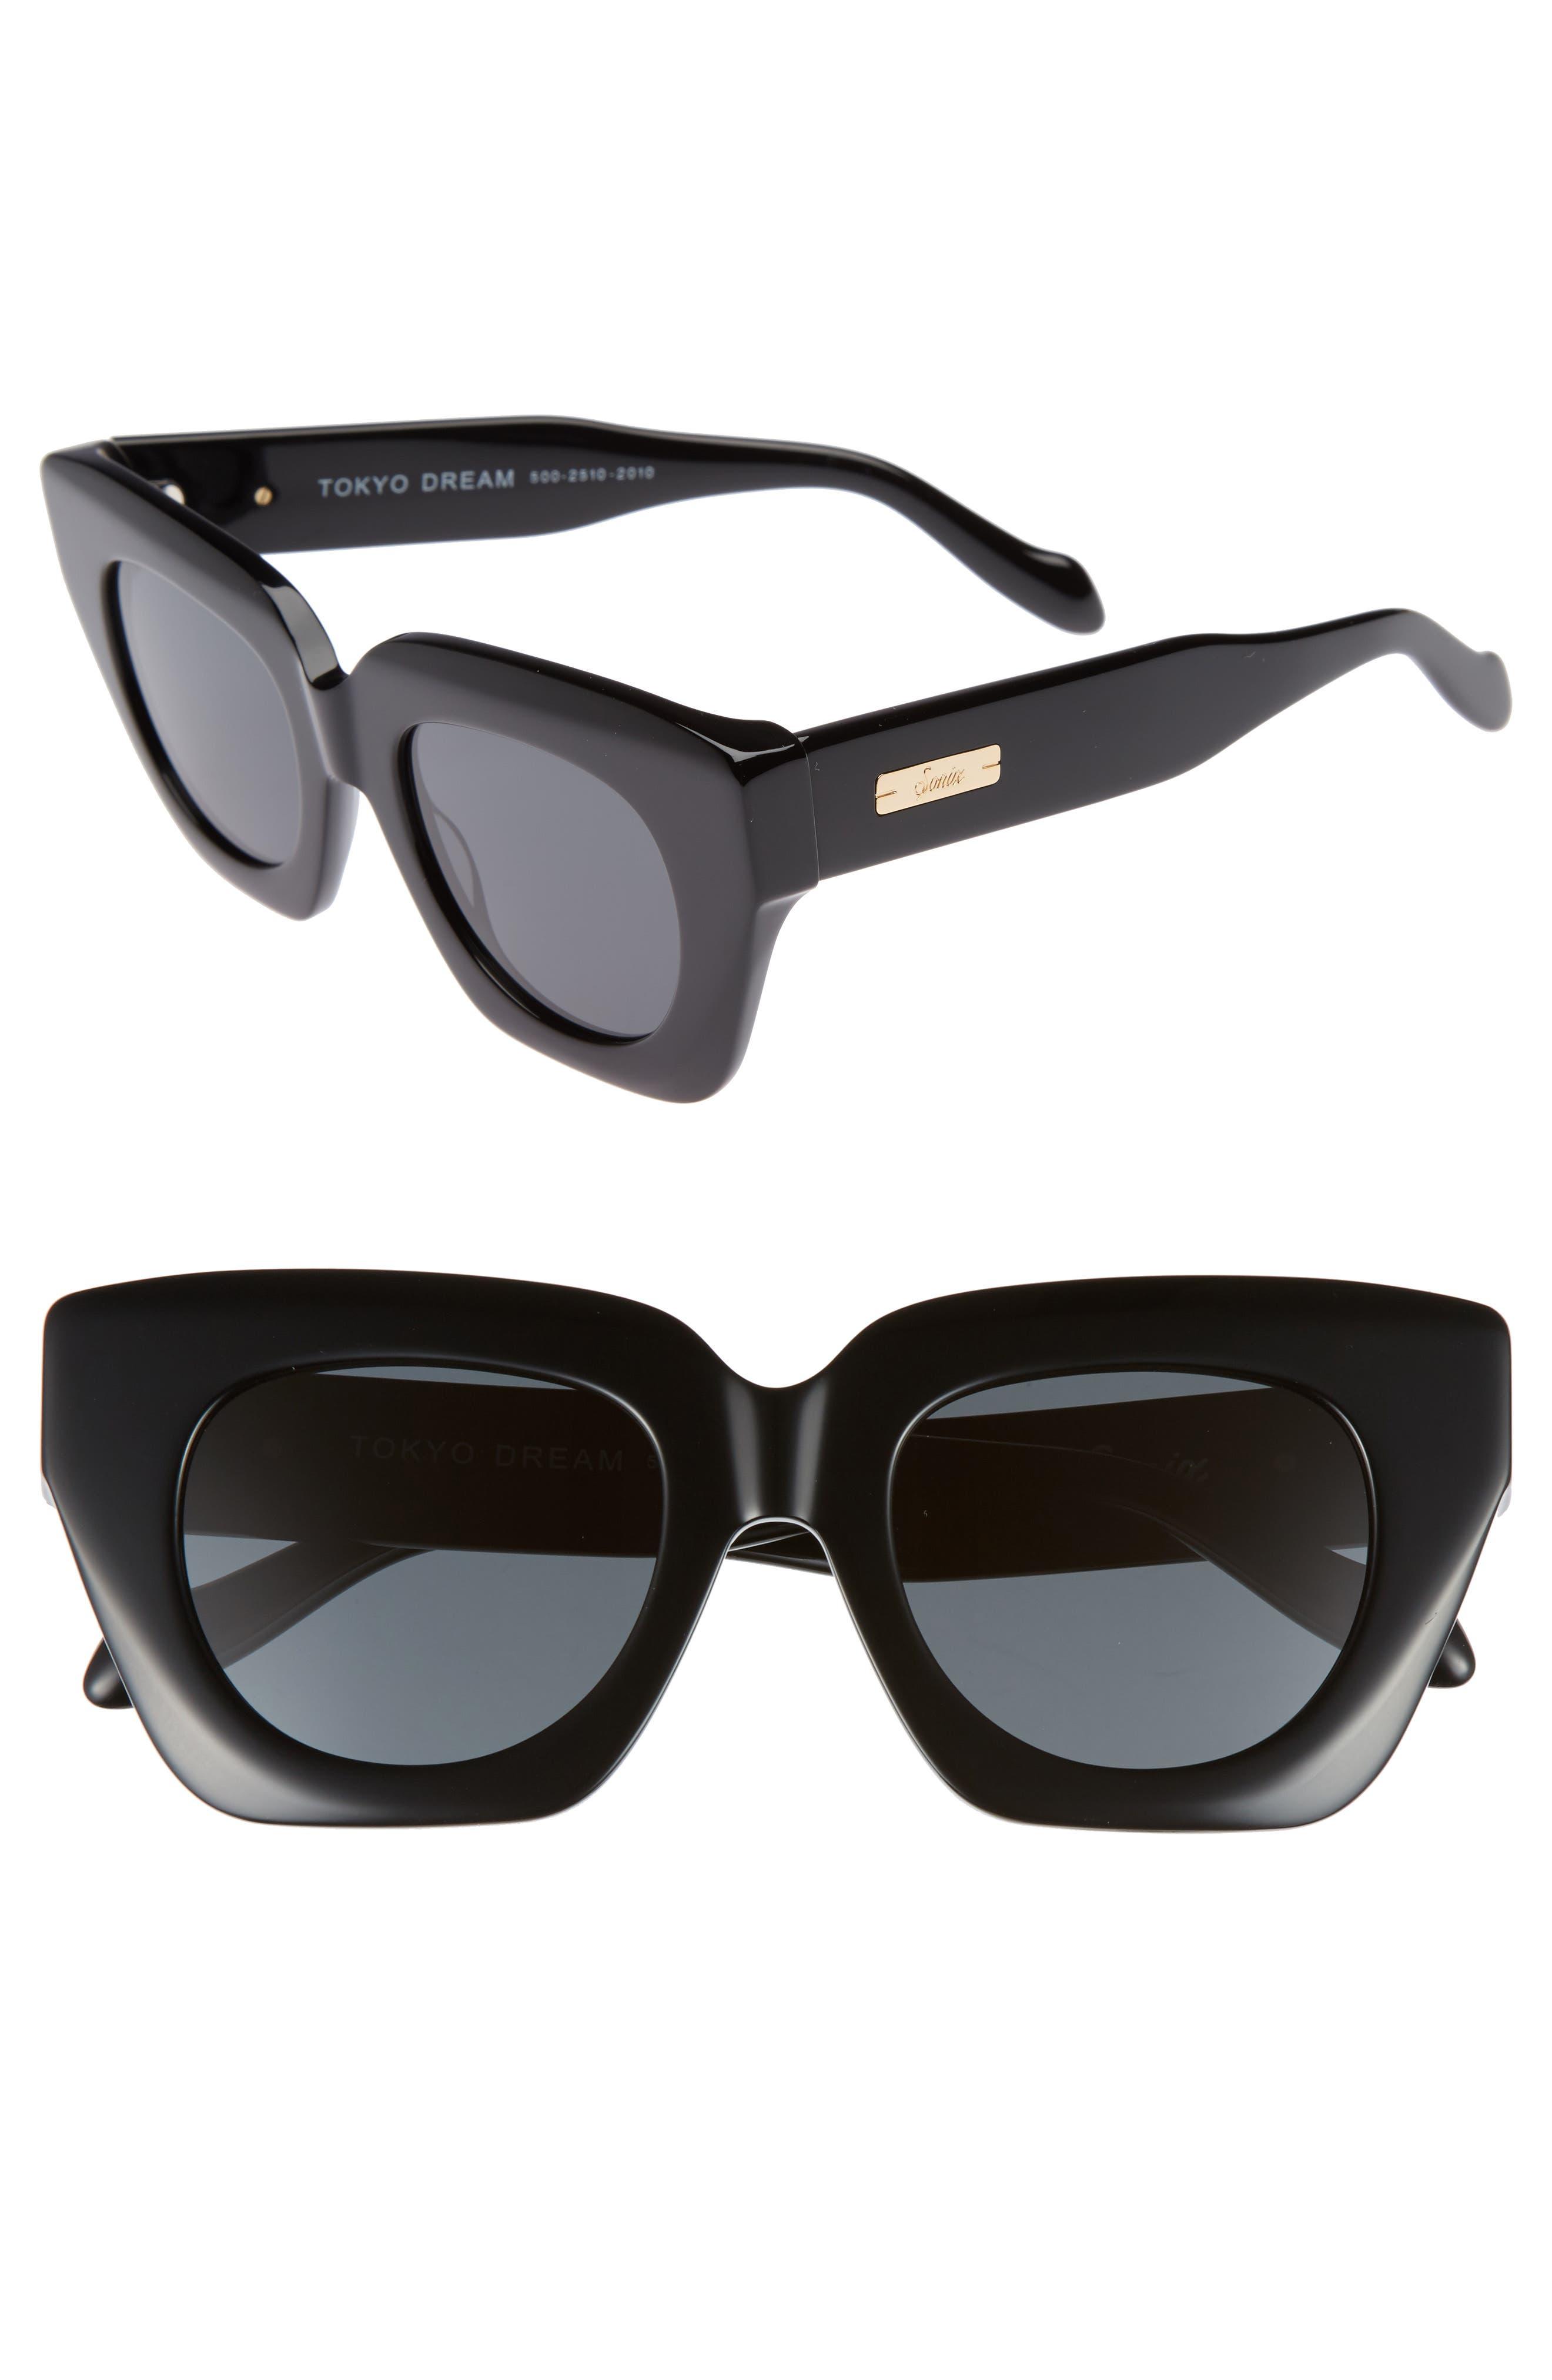 Sonix Tokyo Dream 50mm Cat Eye Sunglasses